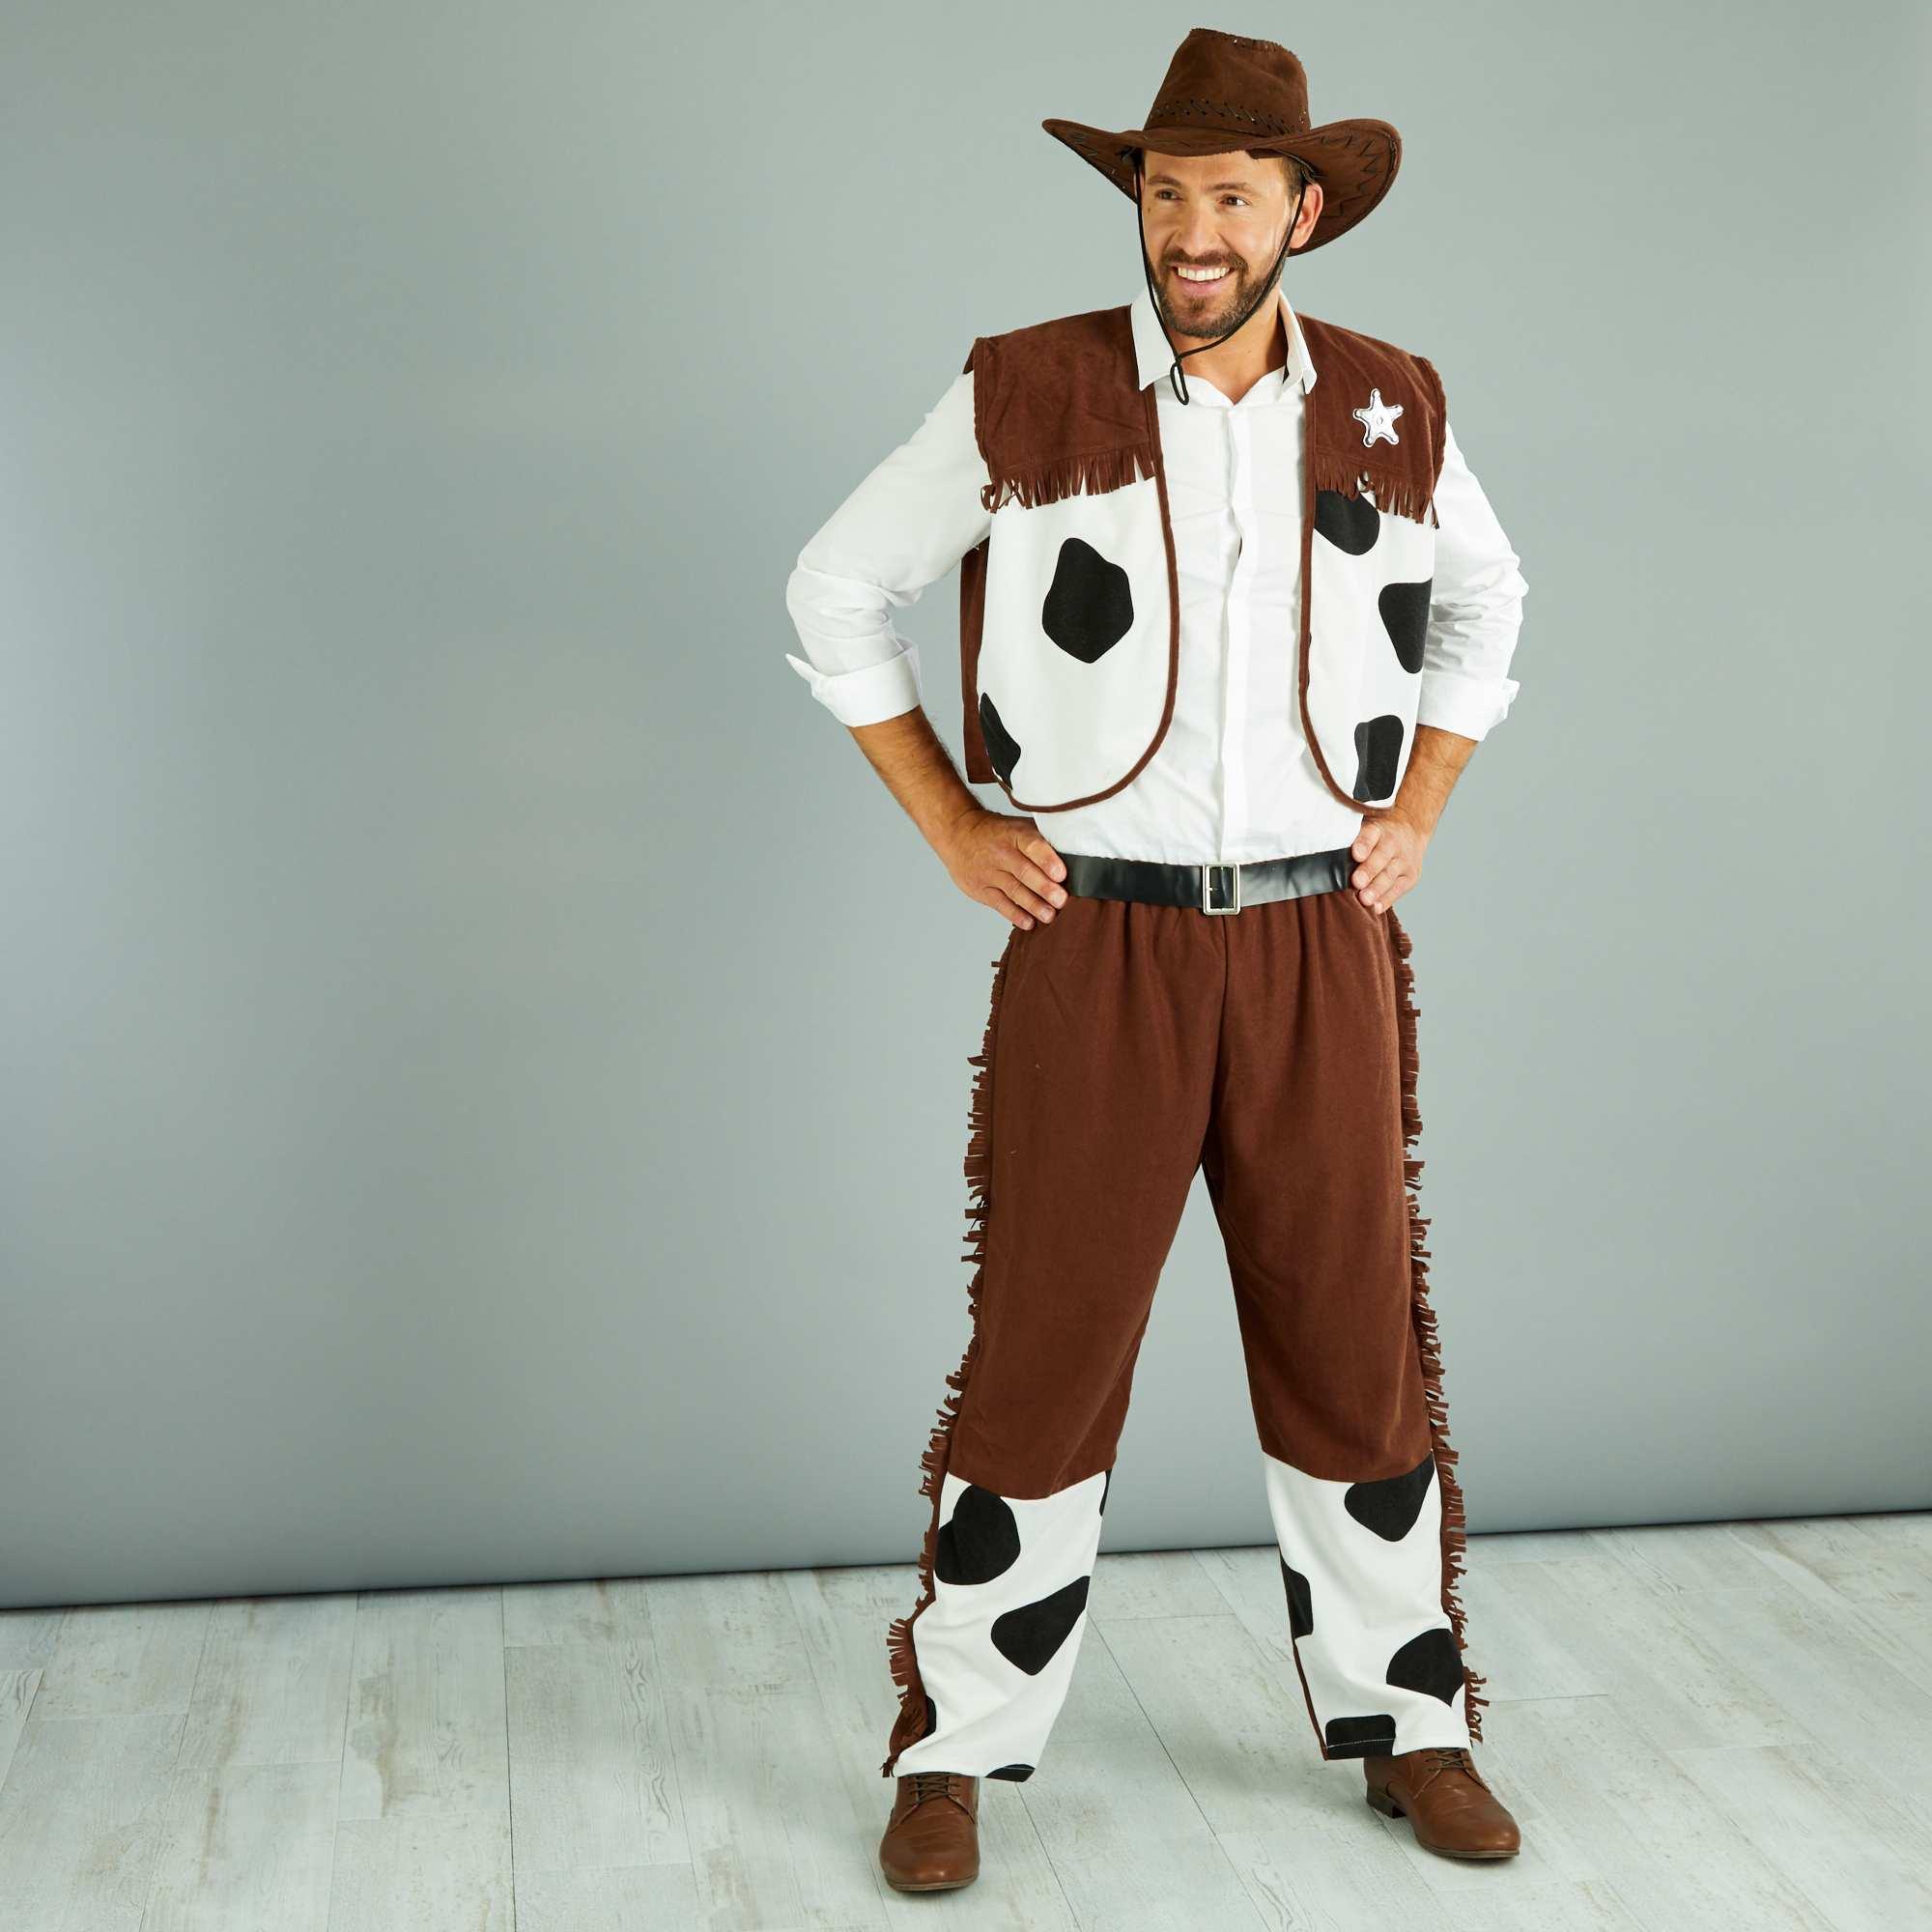 D guisement de cow boy homme kiabi 20 00 - Deguisement western homme ...